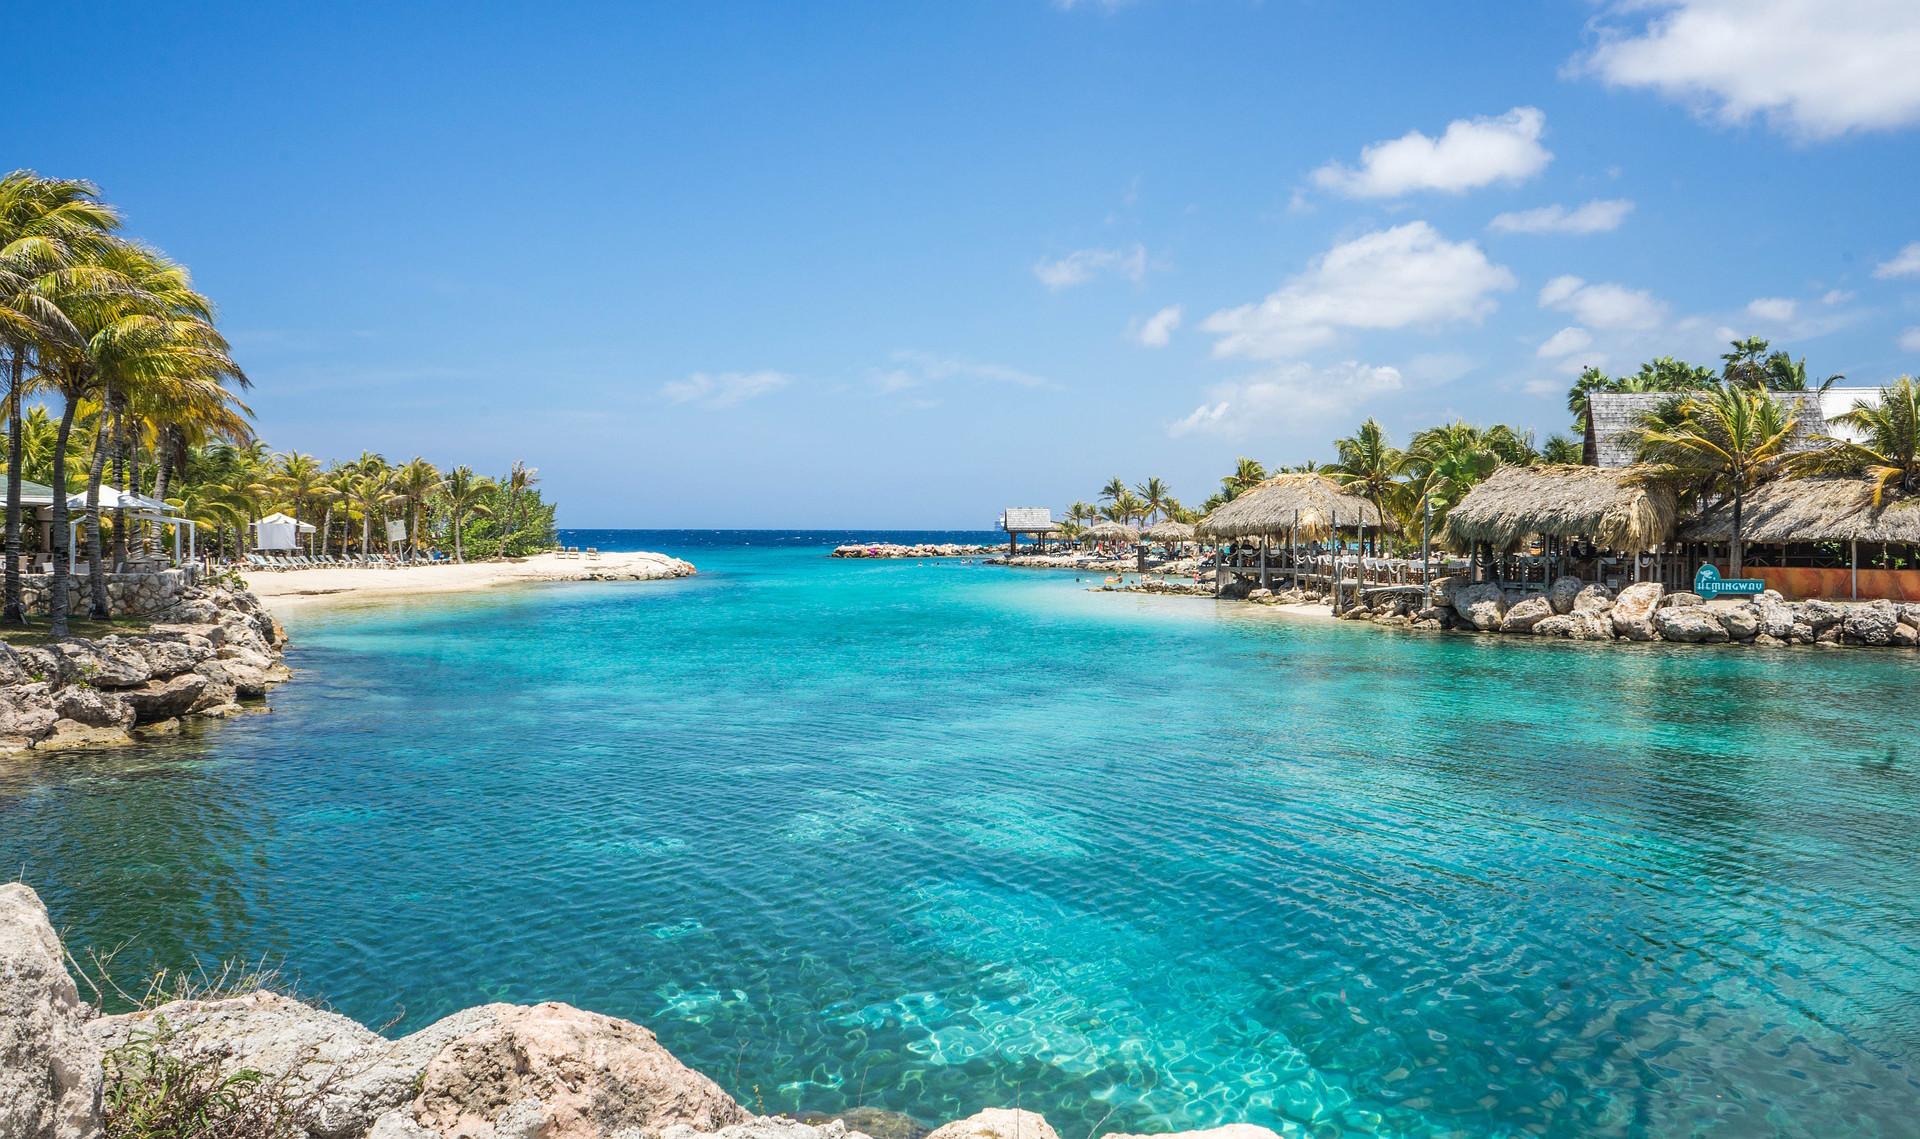 news-main-caribbean-tourism-on-the-upswing.1551280313.jpg